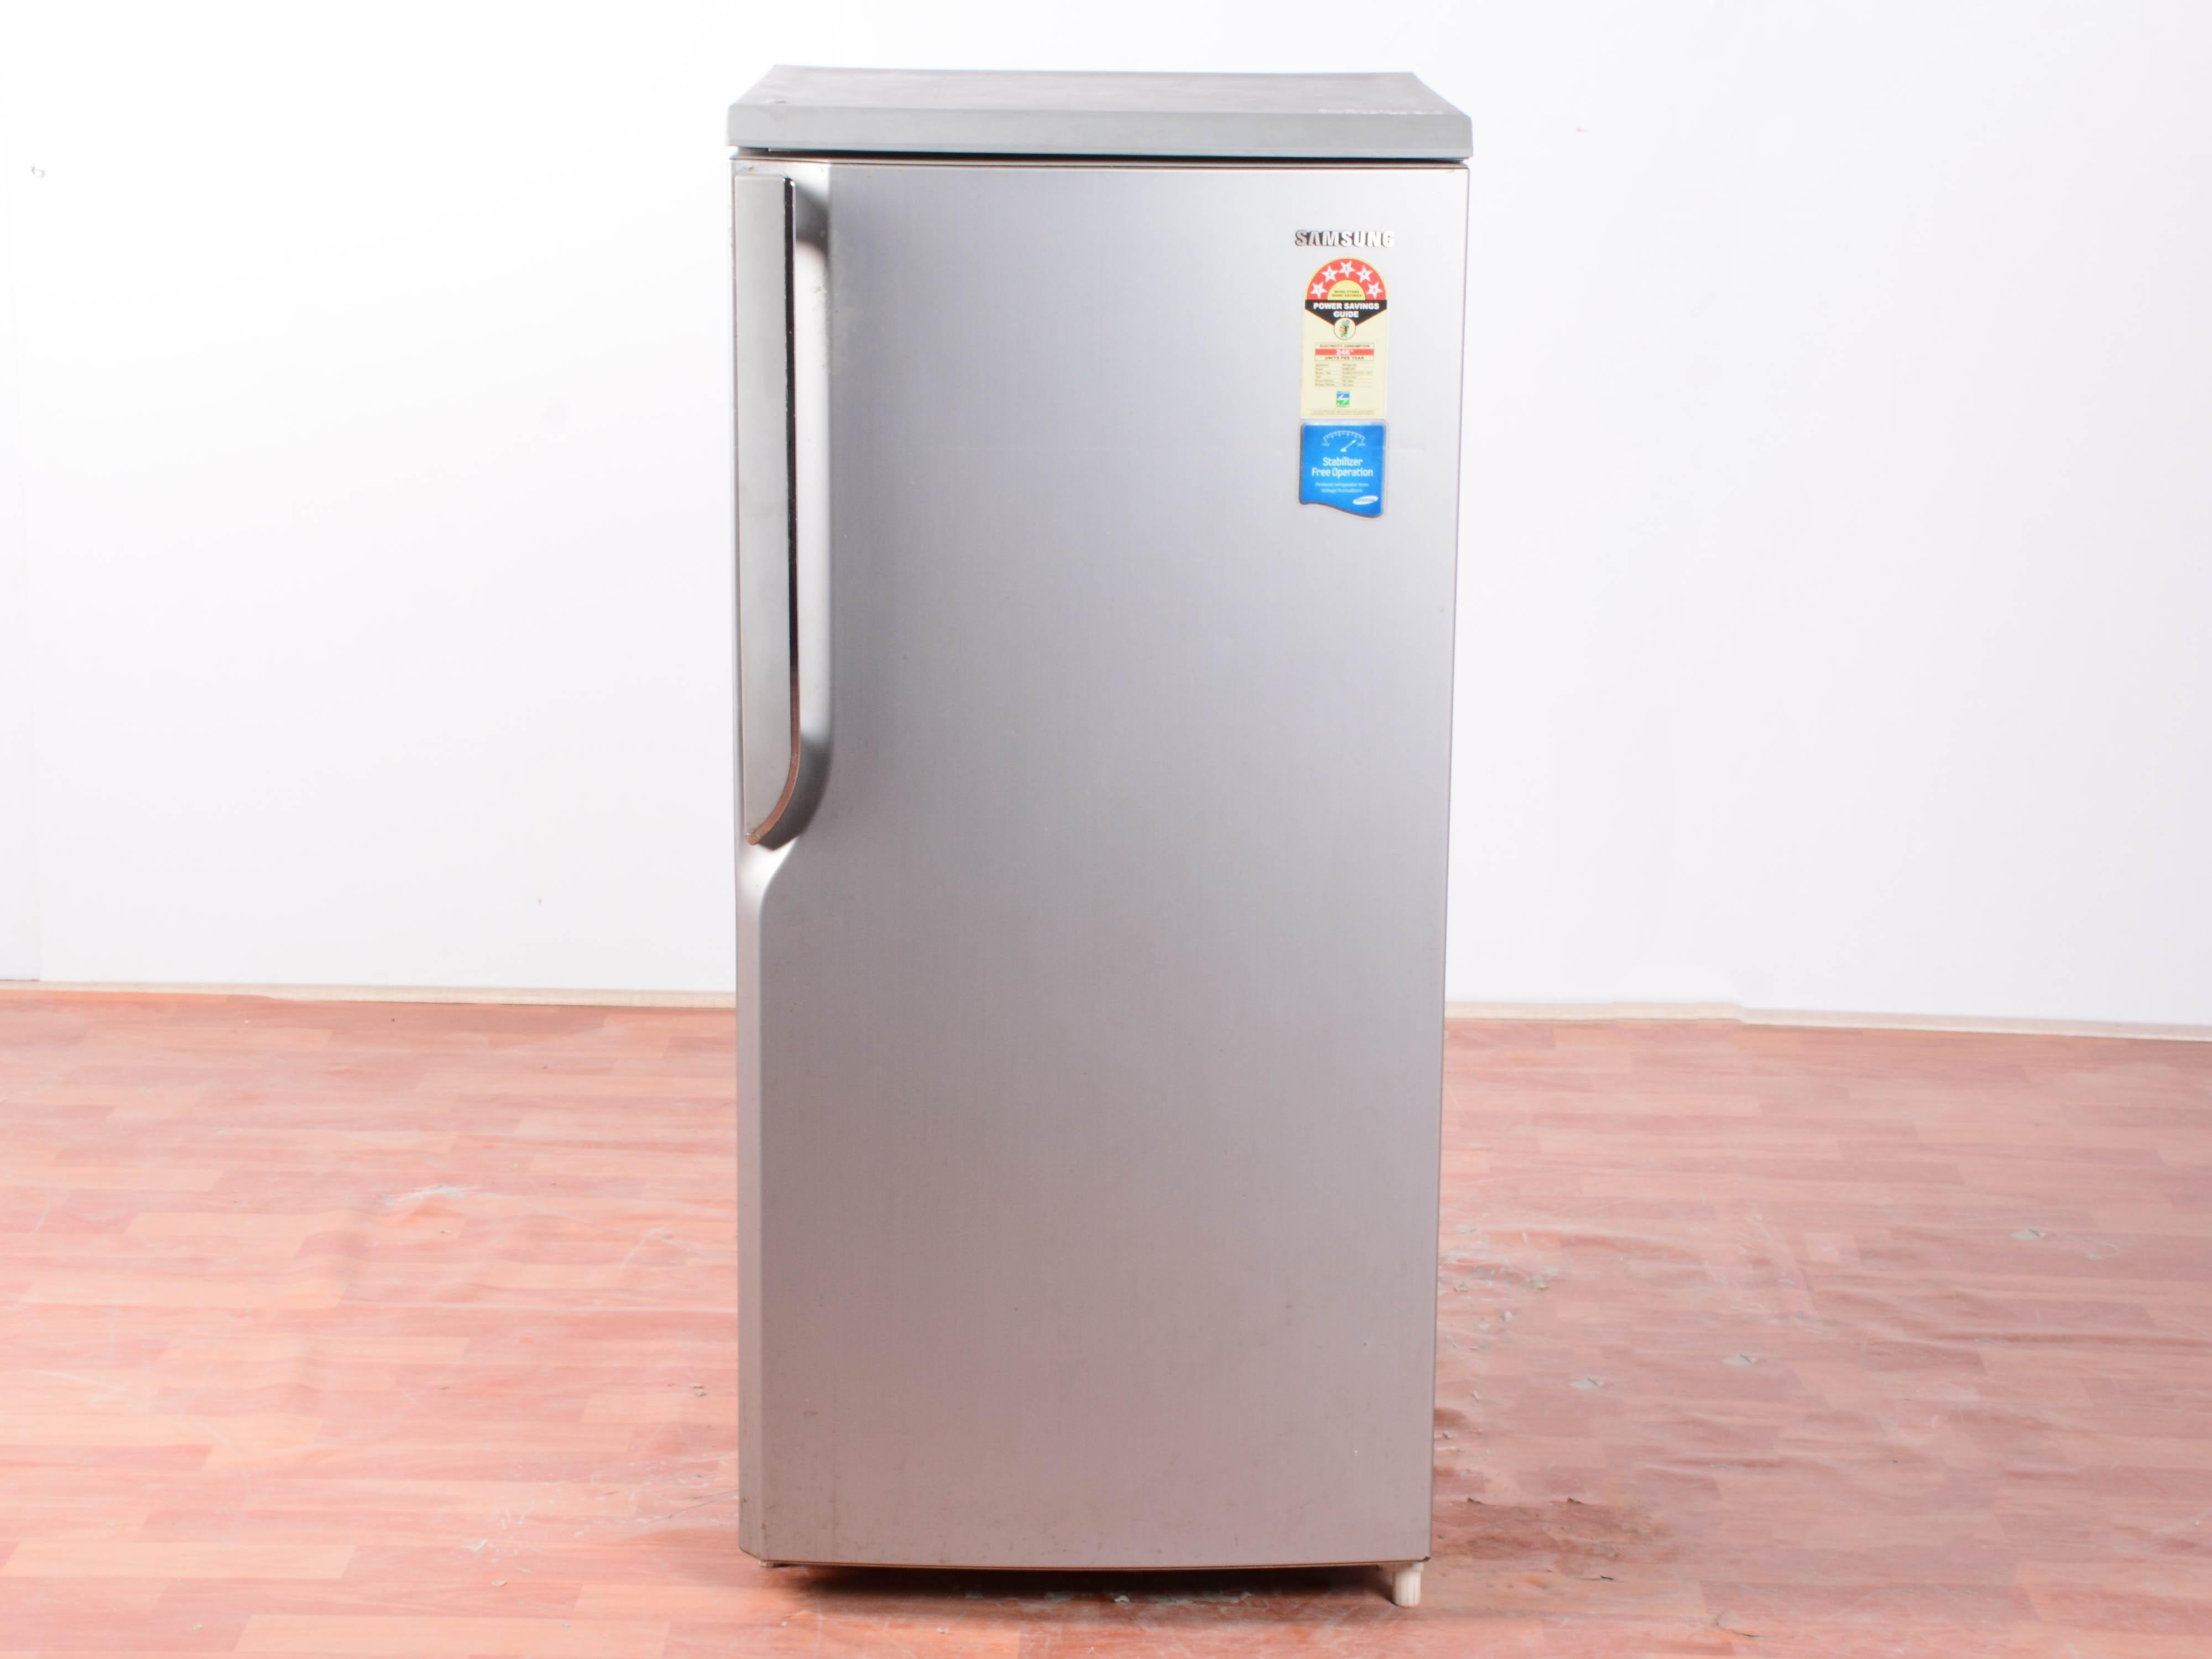 Samsung Single Door Refrigerator RA23BDPS1 Image